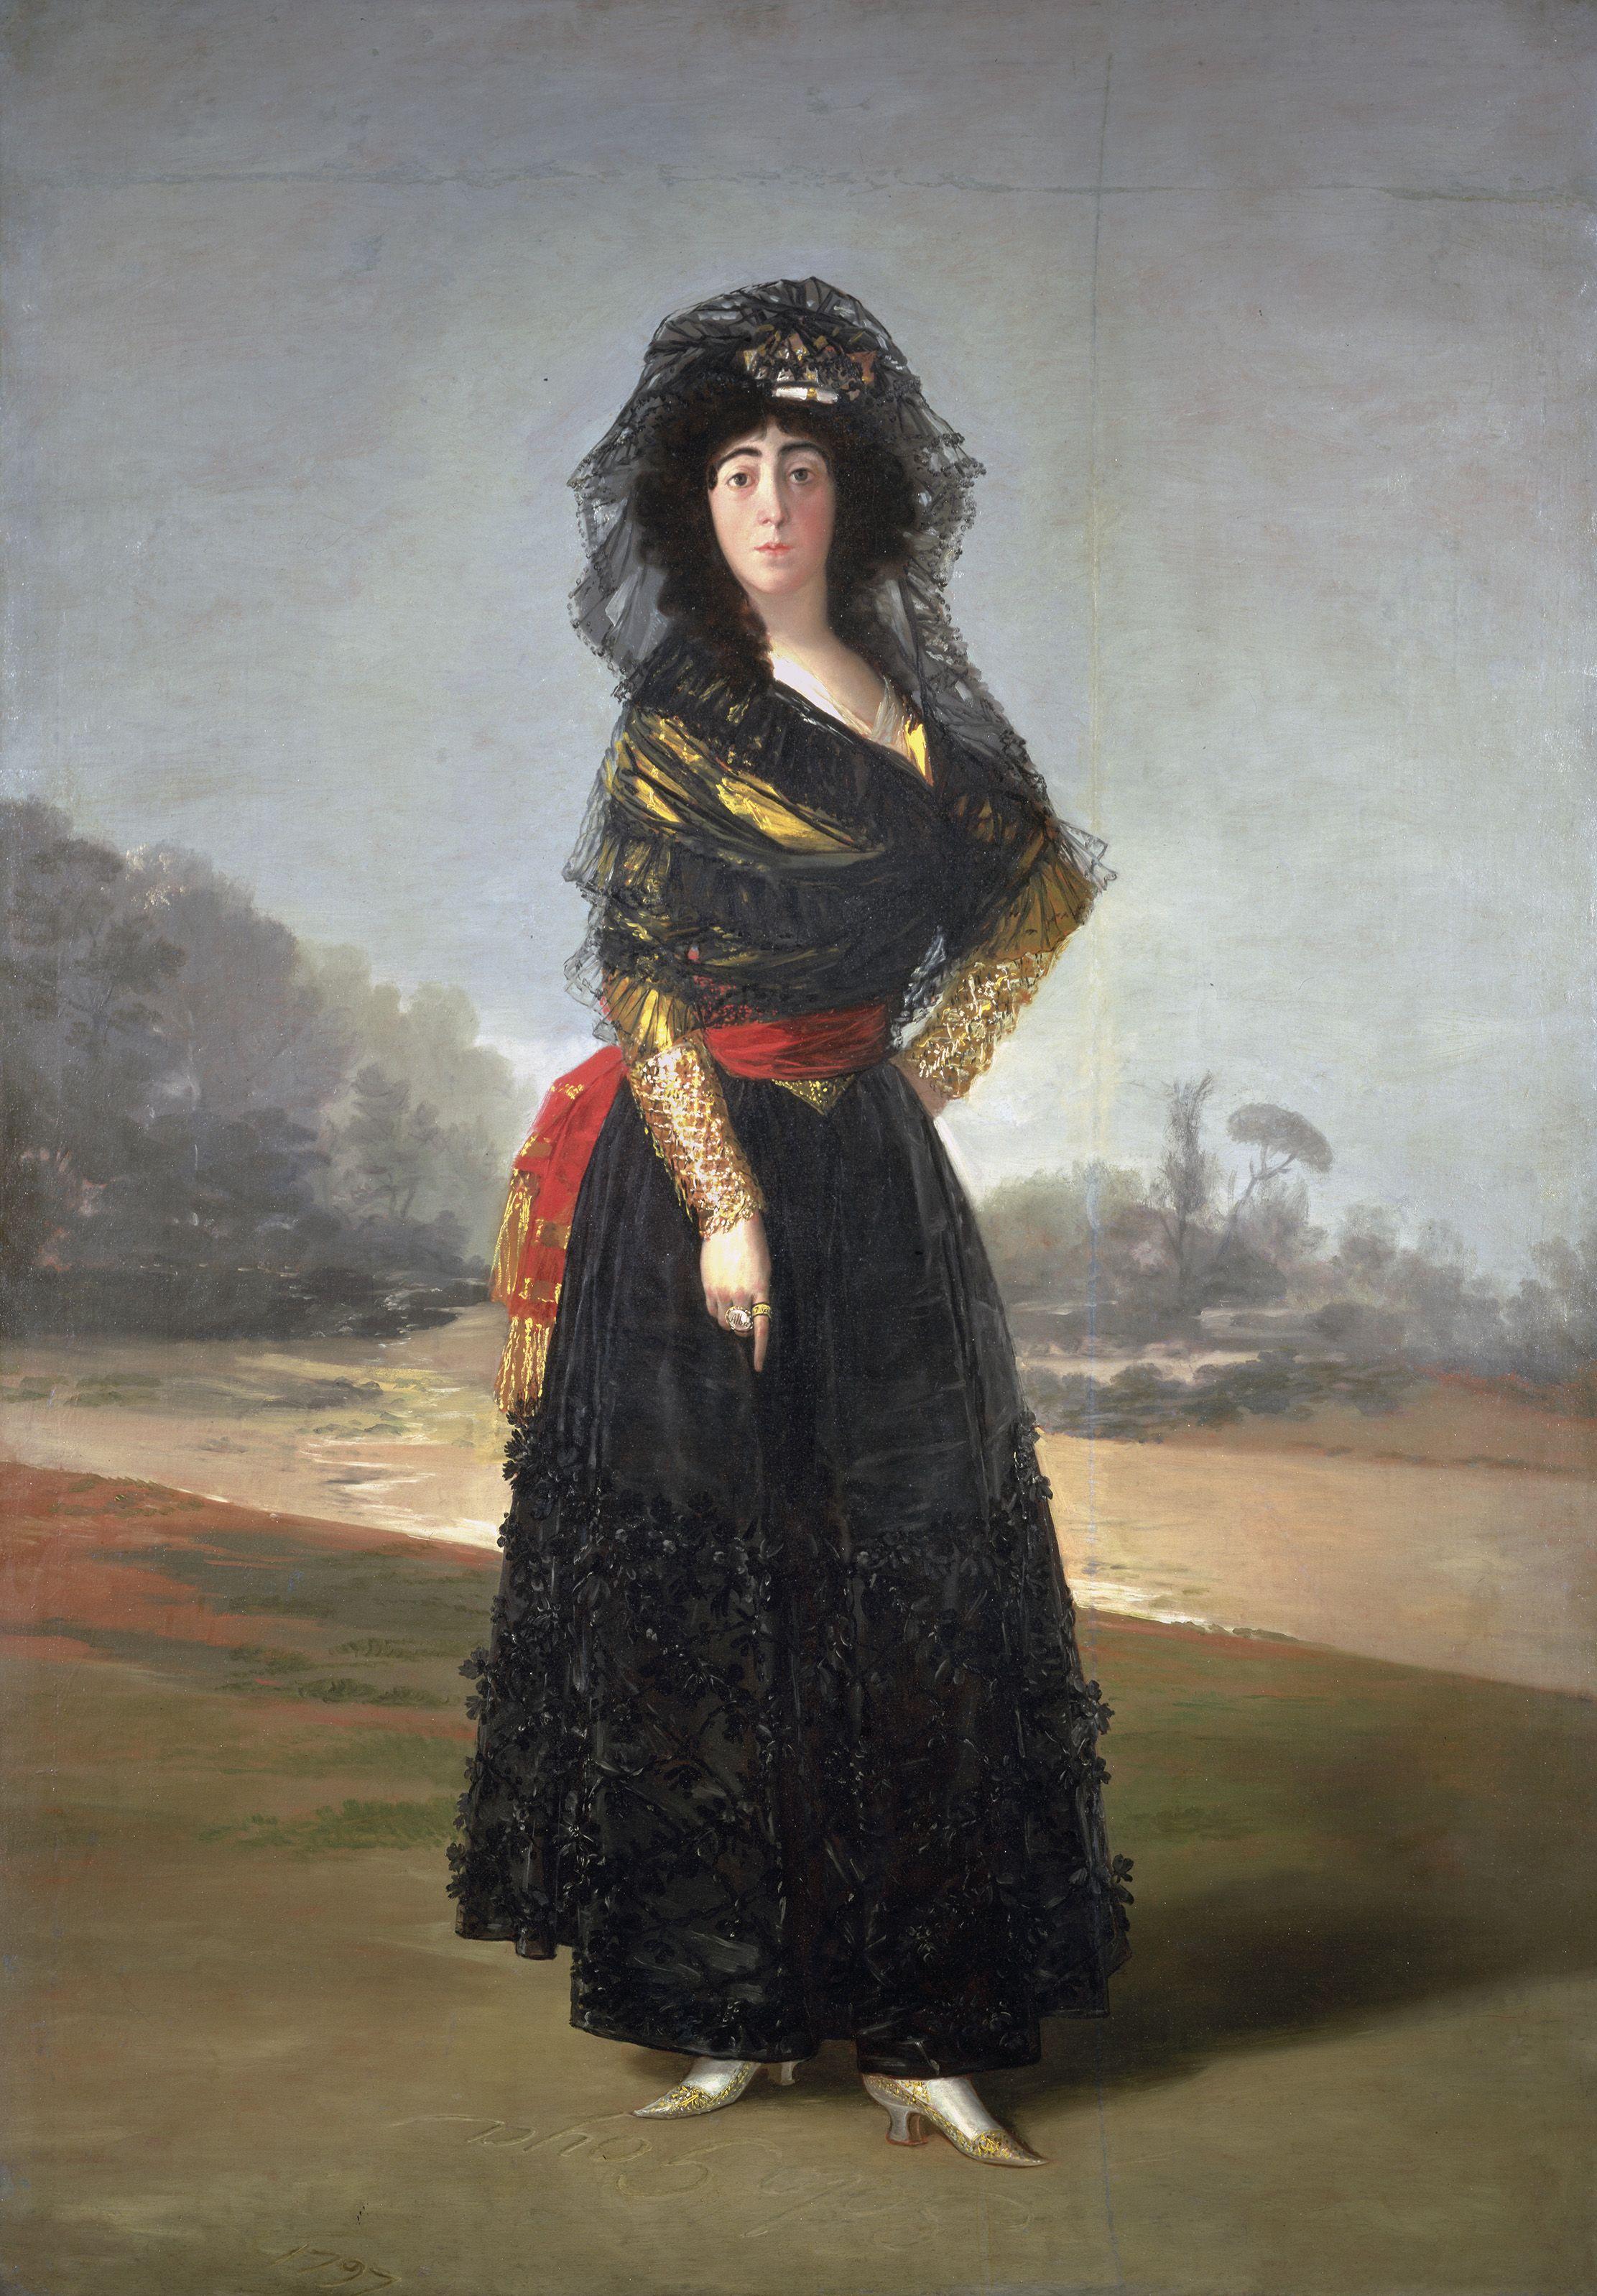 Figure 2. Goya, Duquesa de Alba.